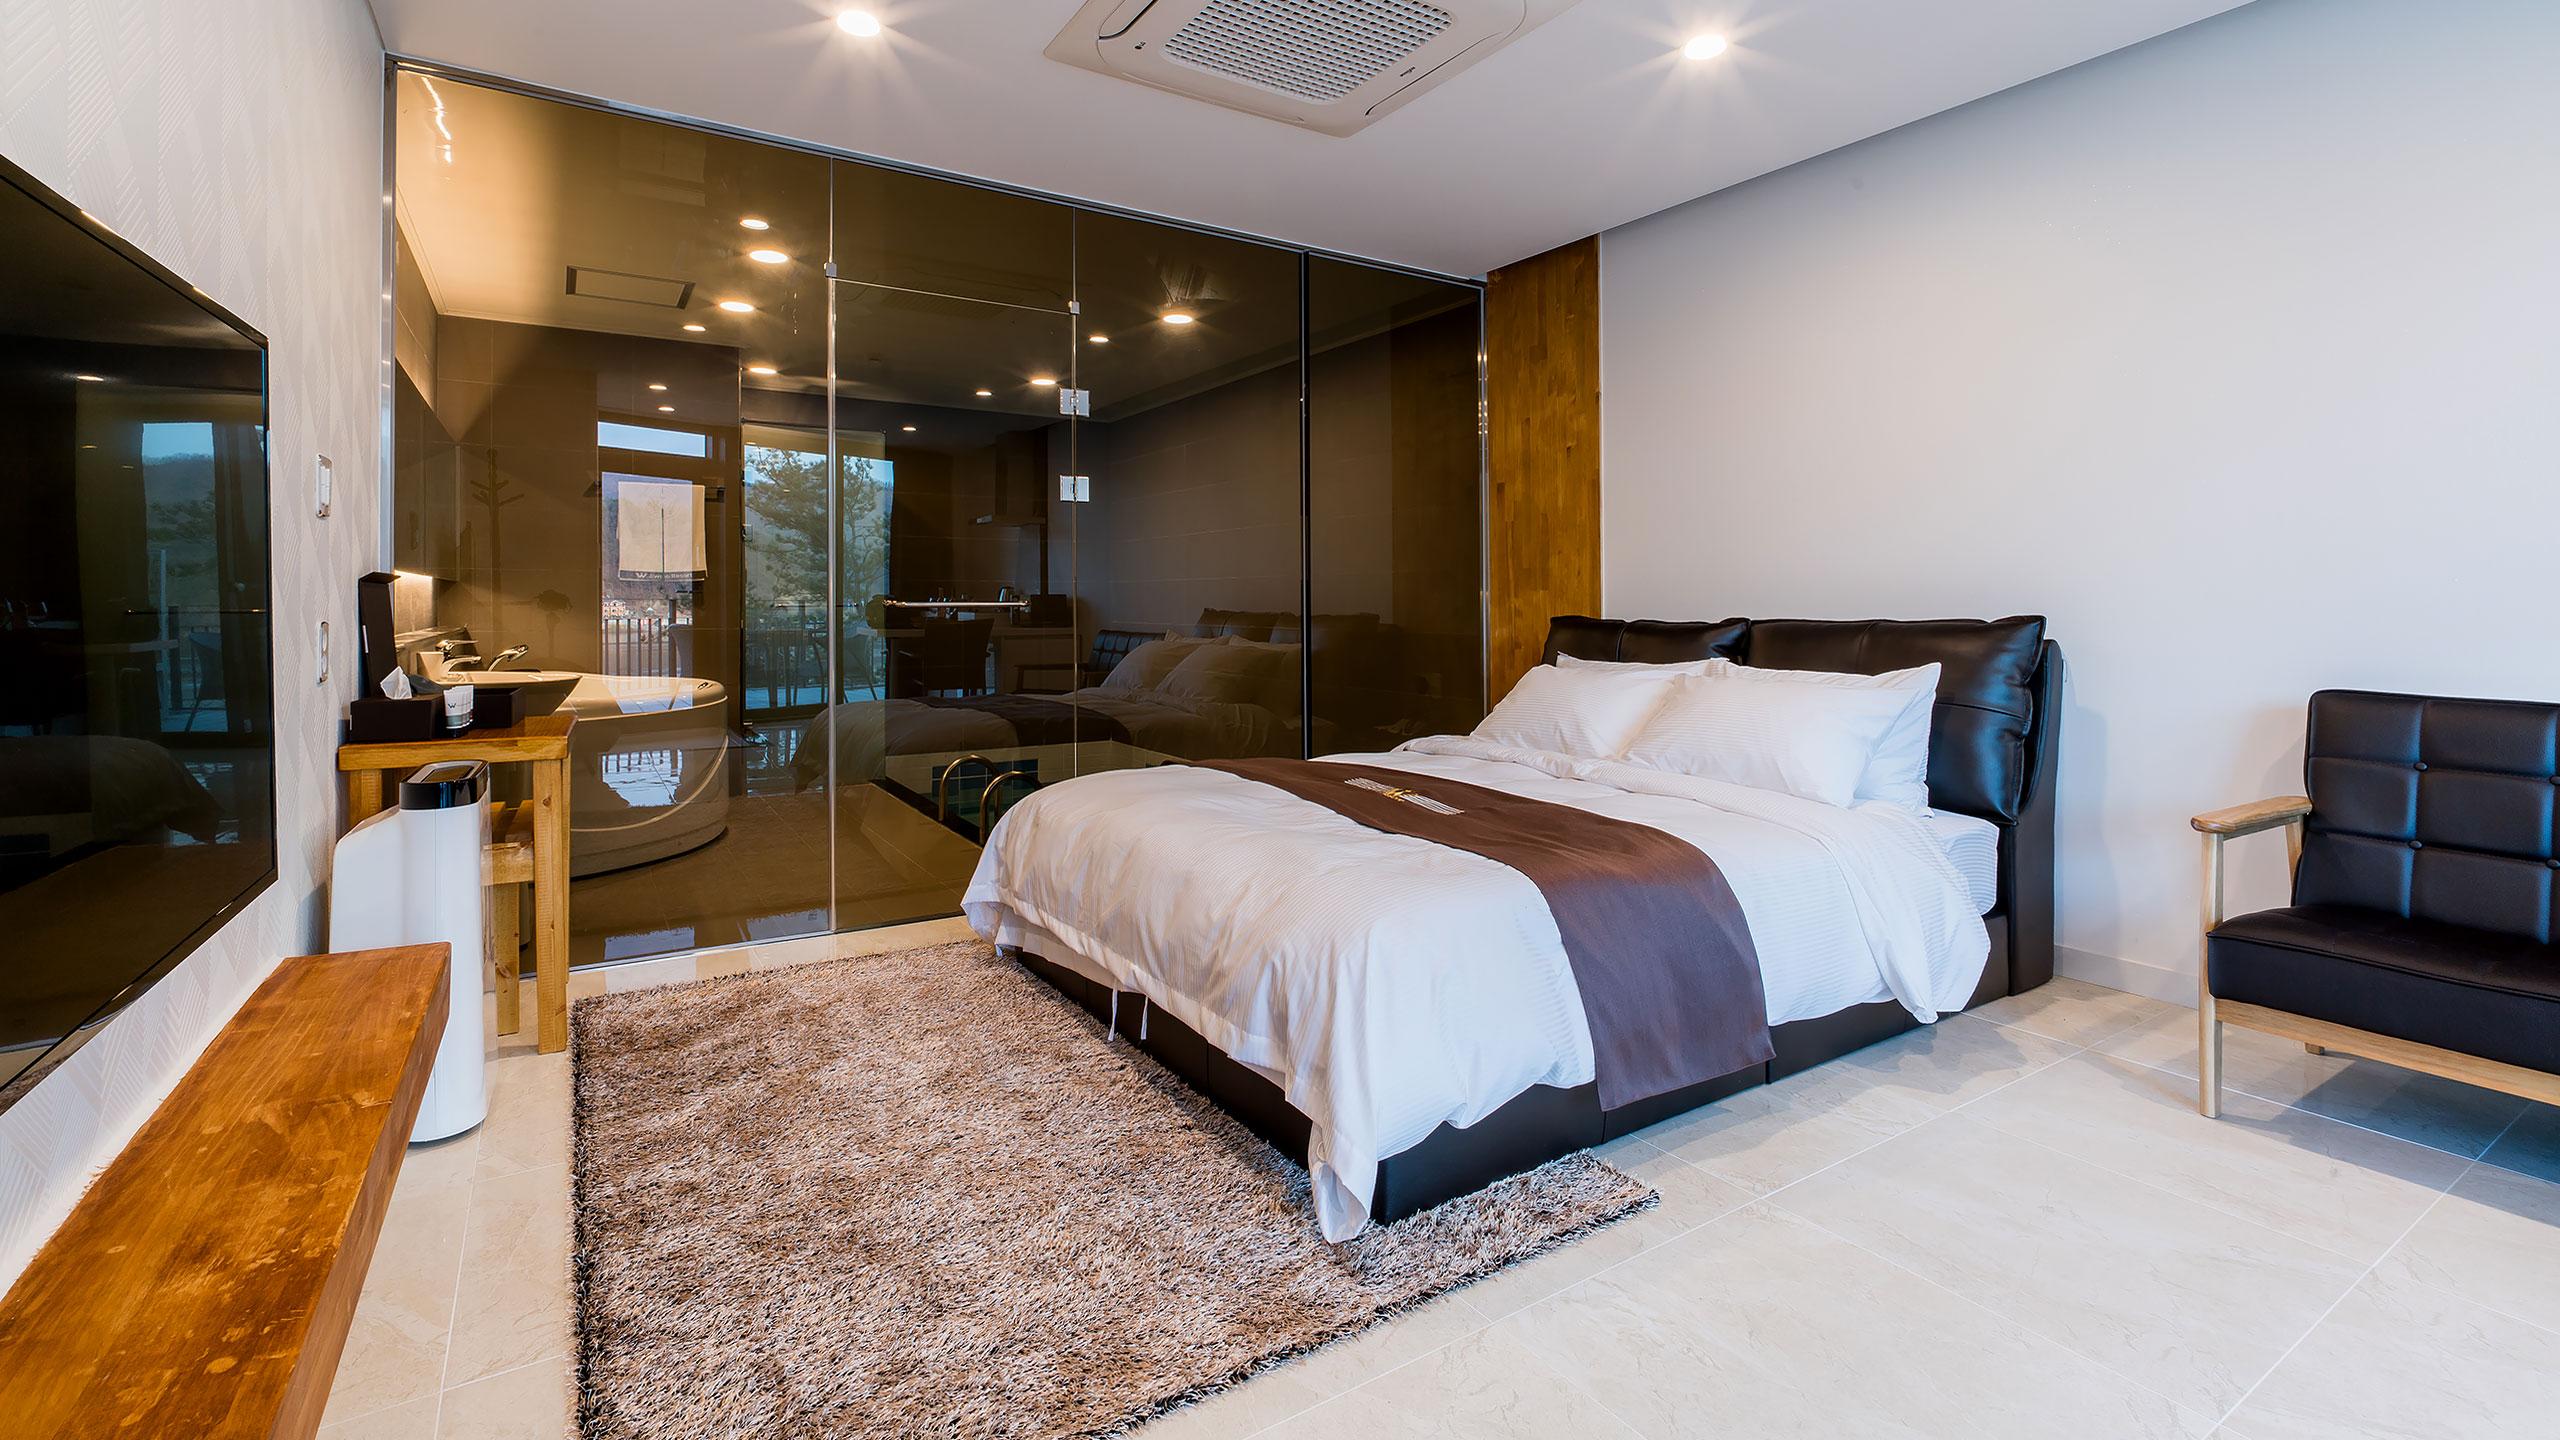 room03_img03